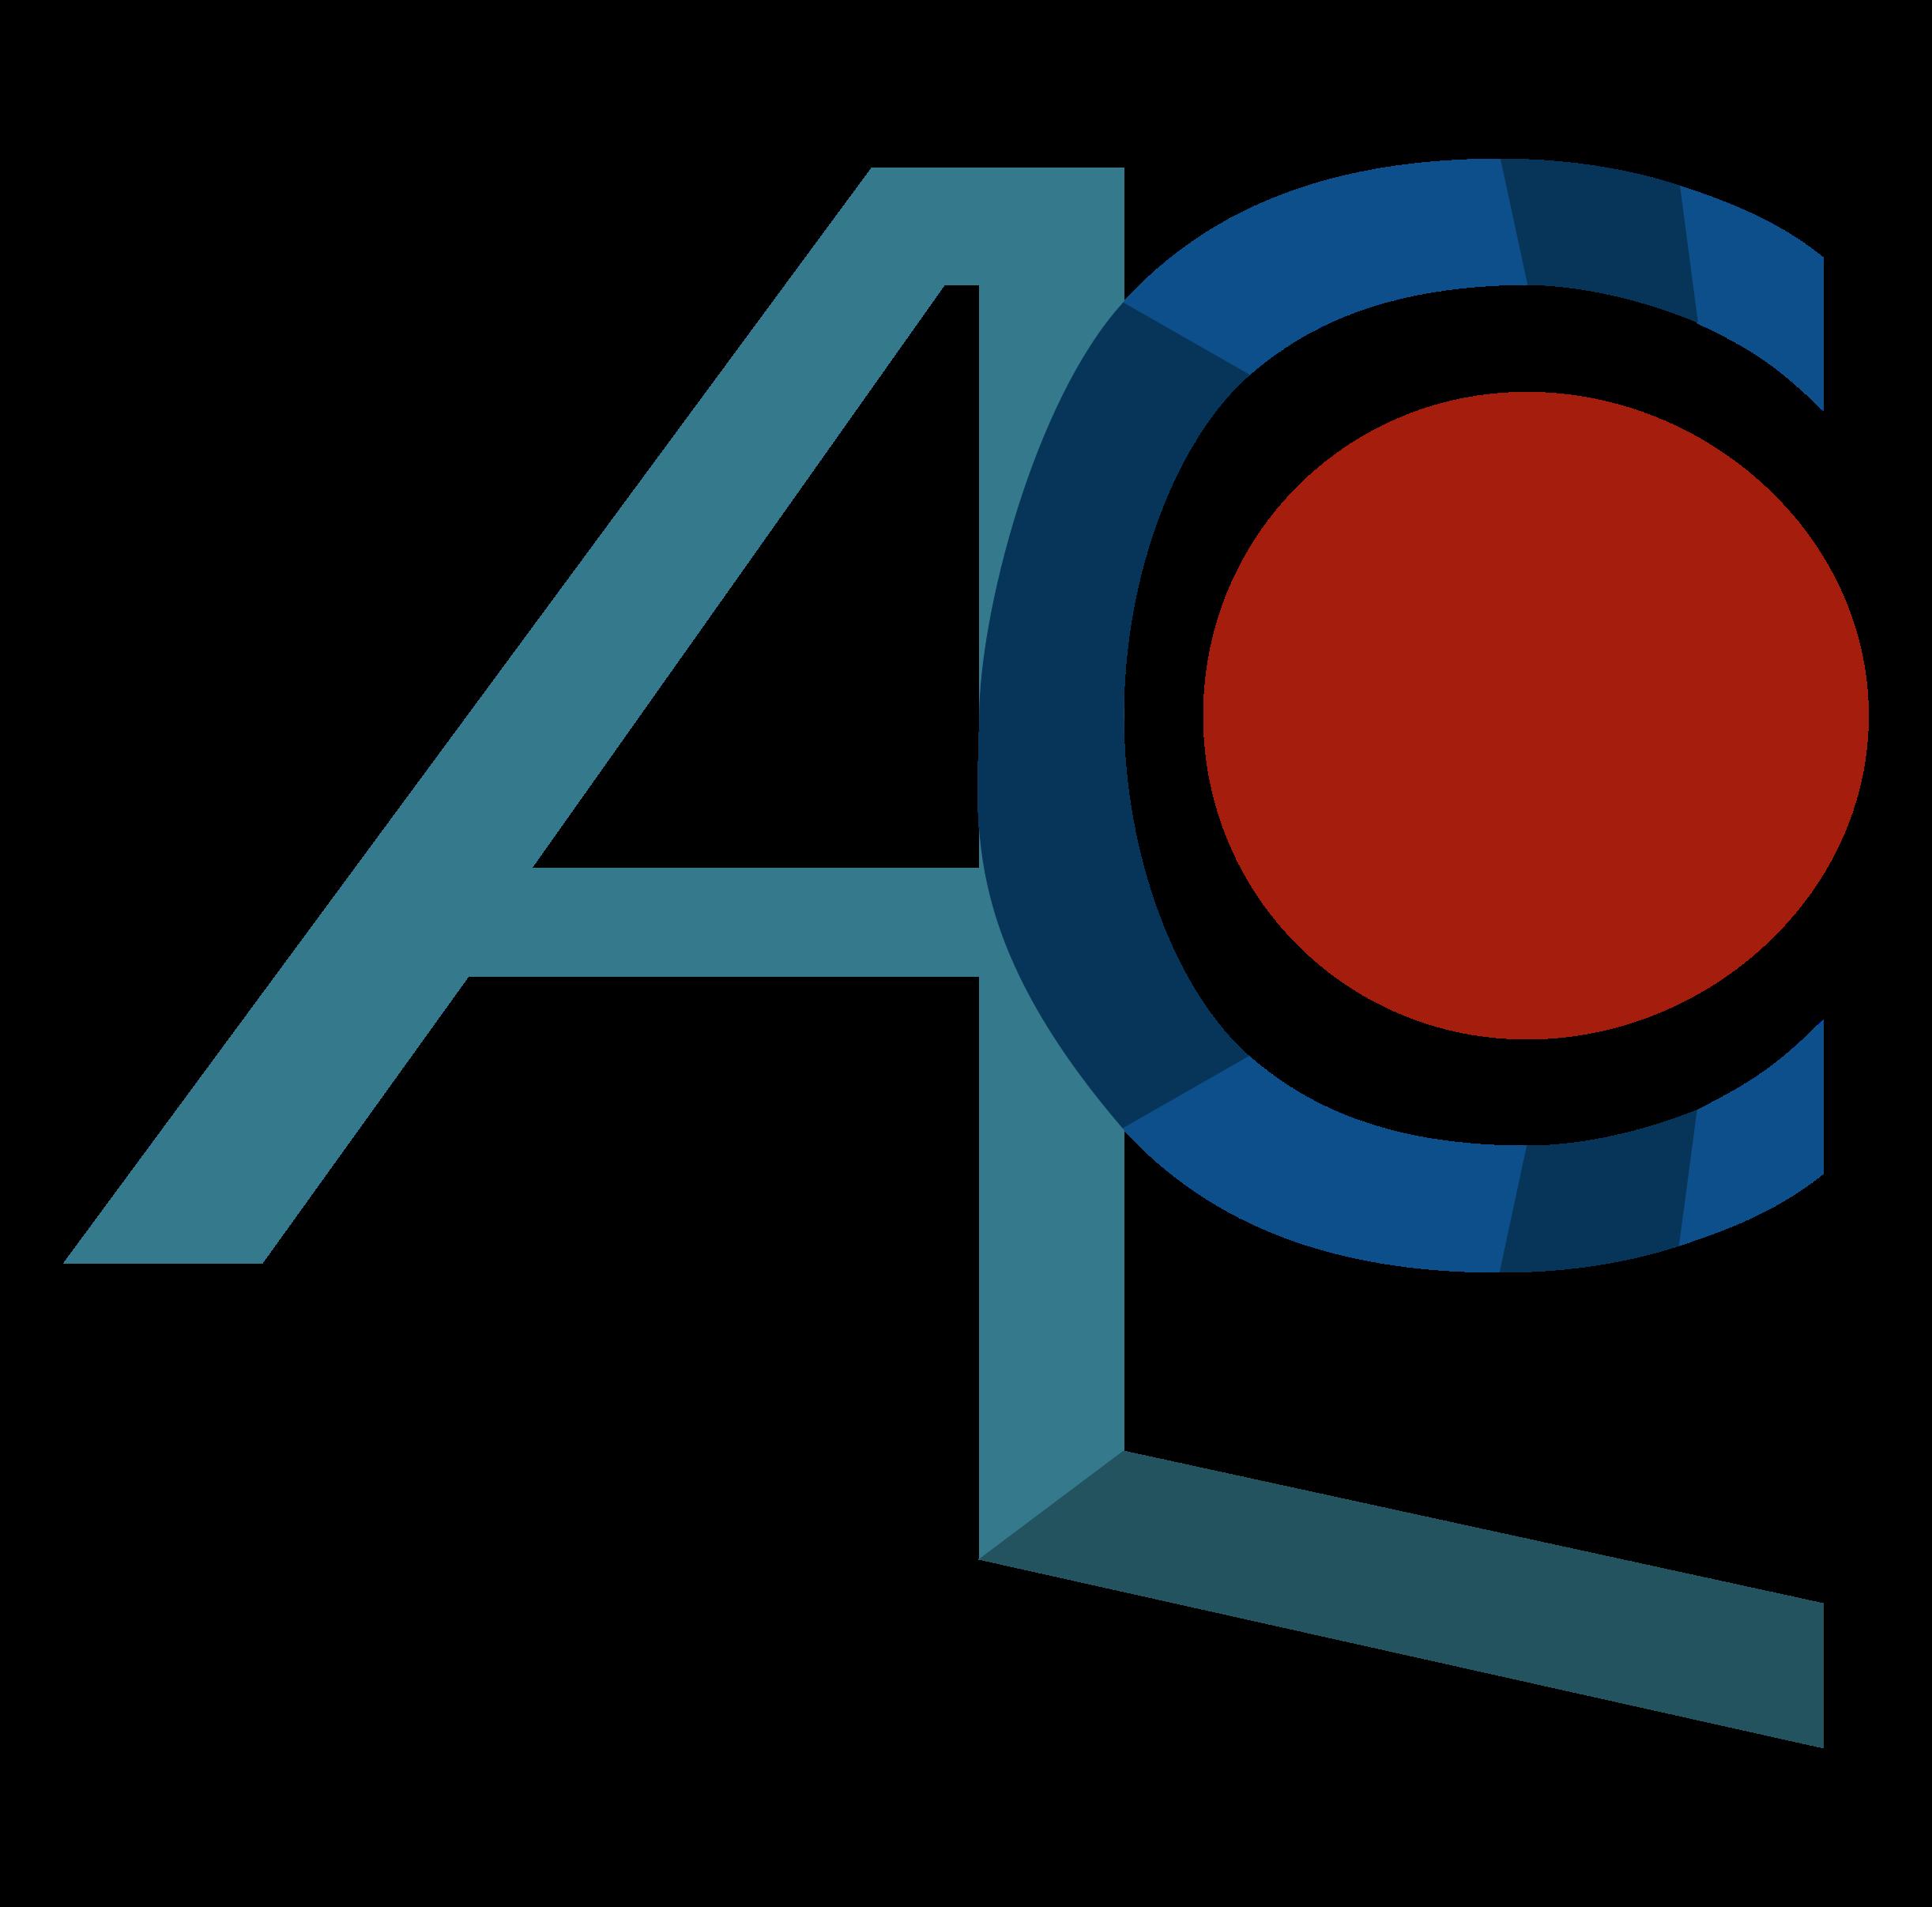 Logo Audicep (Audit Comptabilite Expertise Paies)